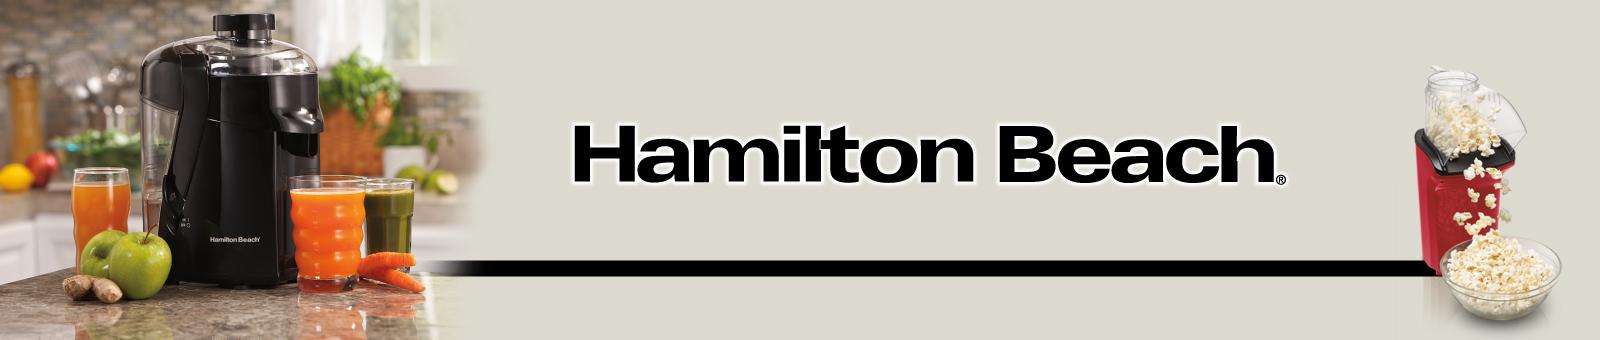 banner-hamilton